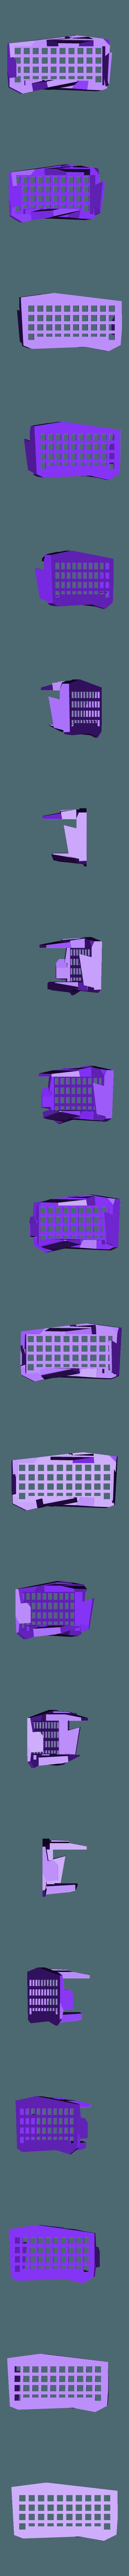 soporte_vertical_nas.stl Download free STL file Seagate NAS vertical stand • 3D printer object, raulrrojas